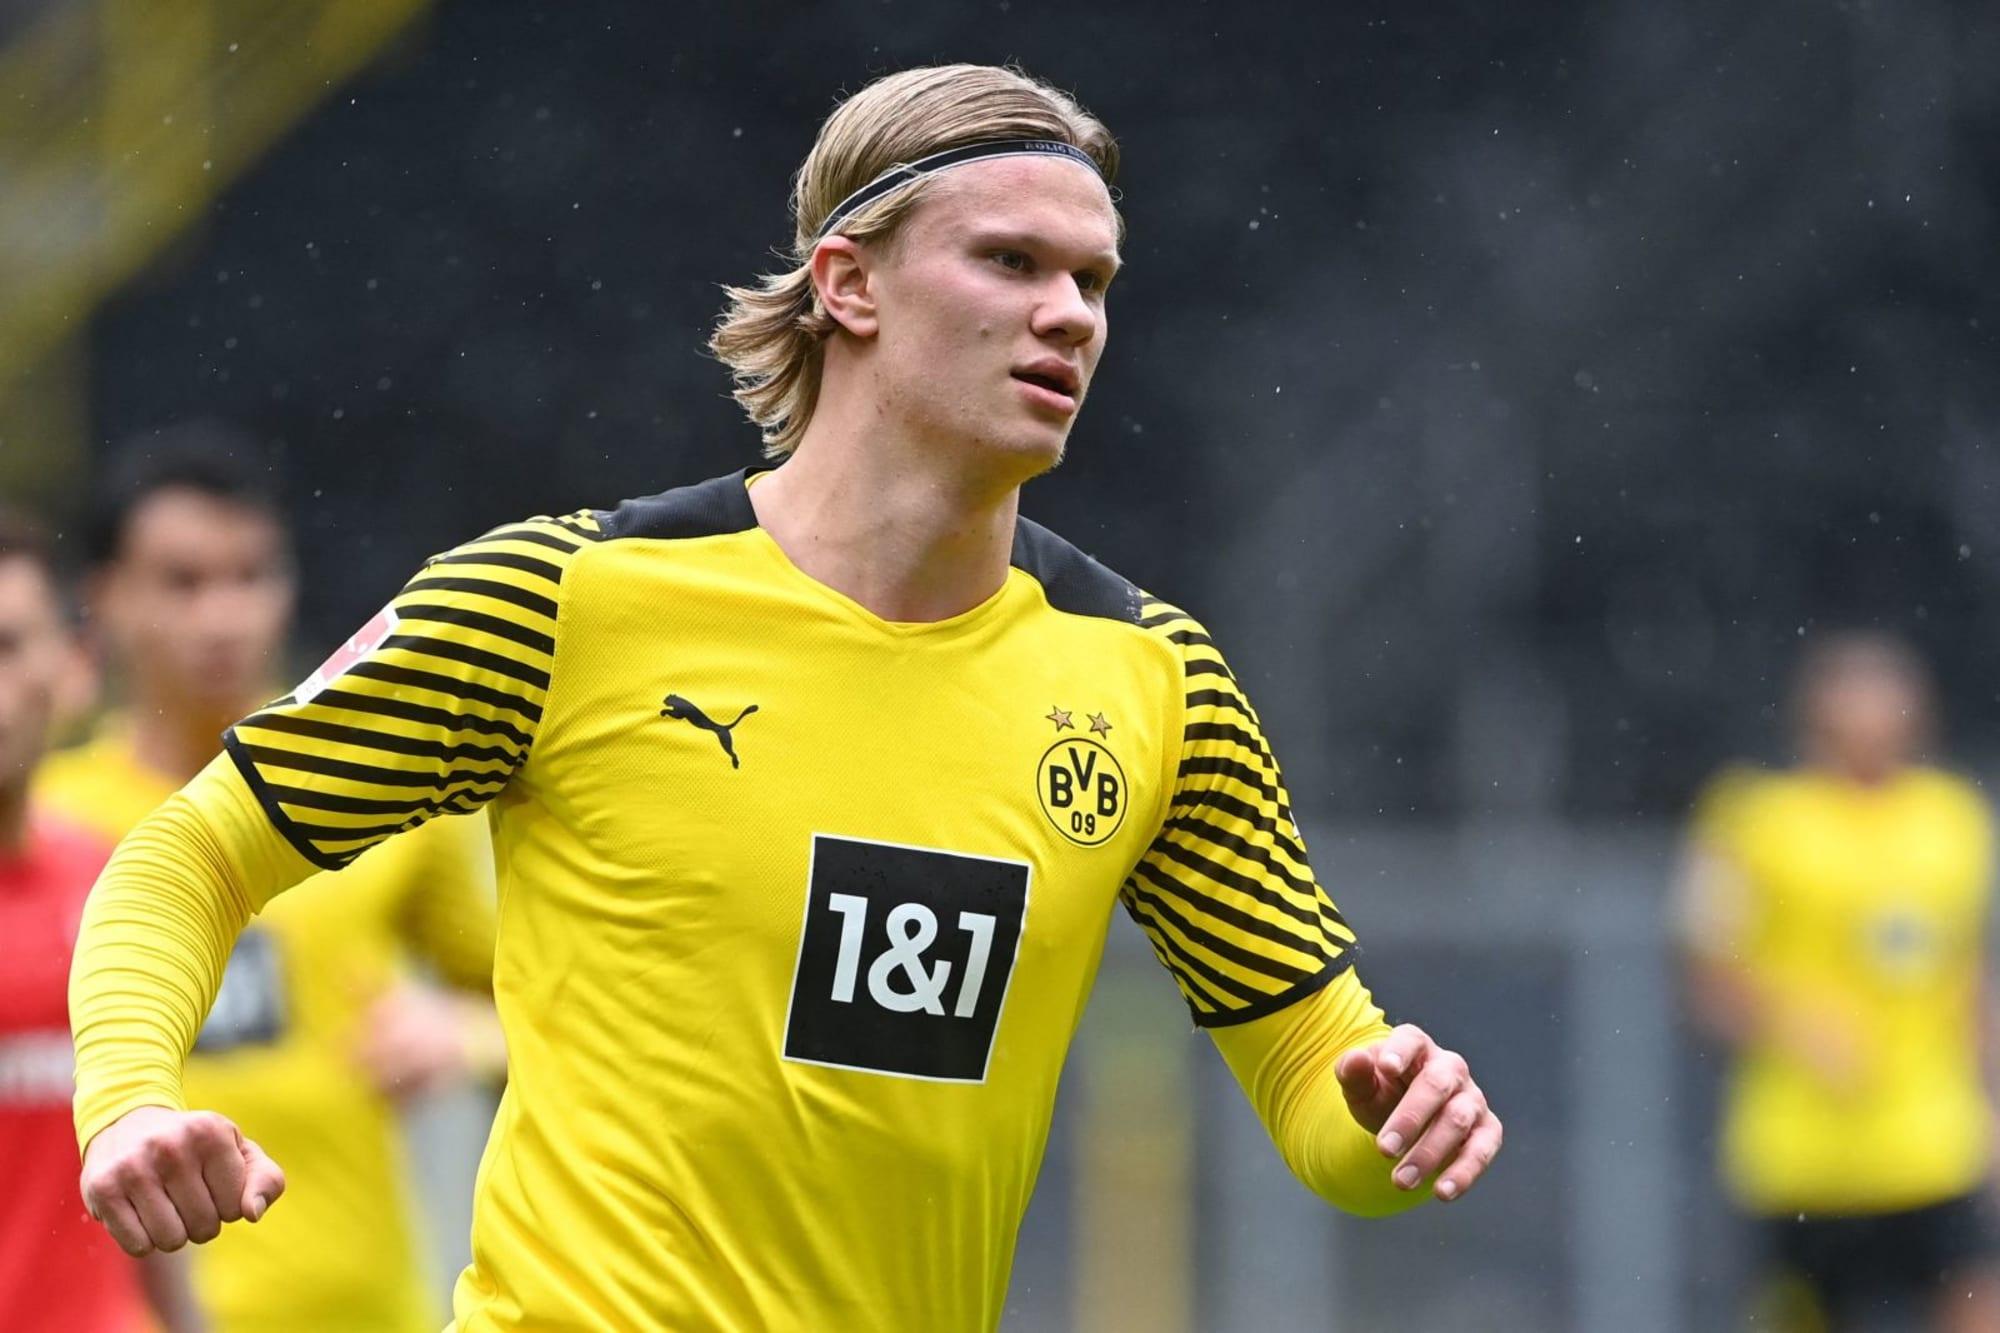 Watch SV Wehen Wiesbaden vs Borussia Dortmund: Live Stream, TV info for DFB-Pokal tie